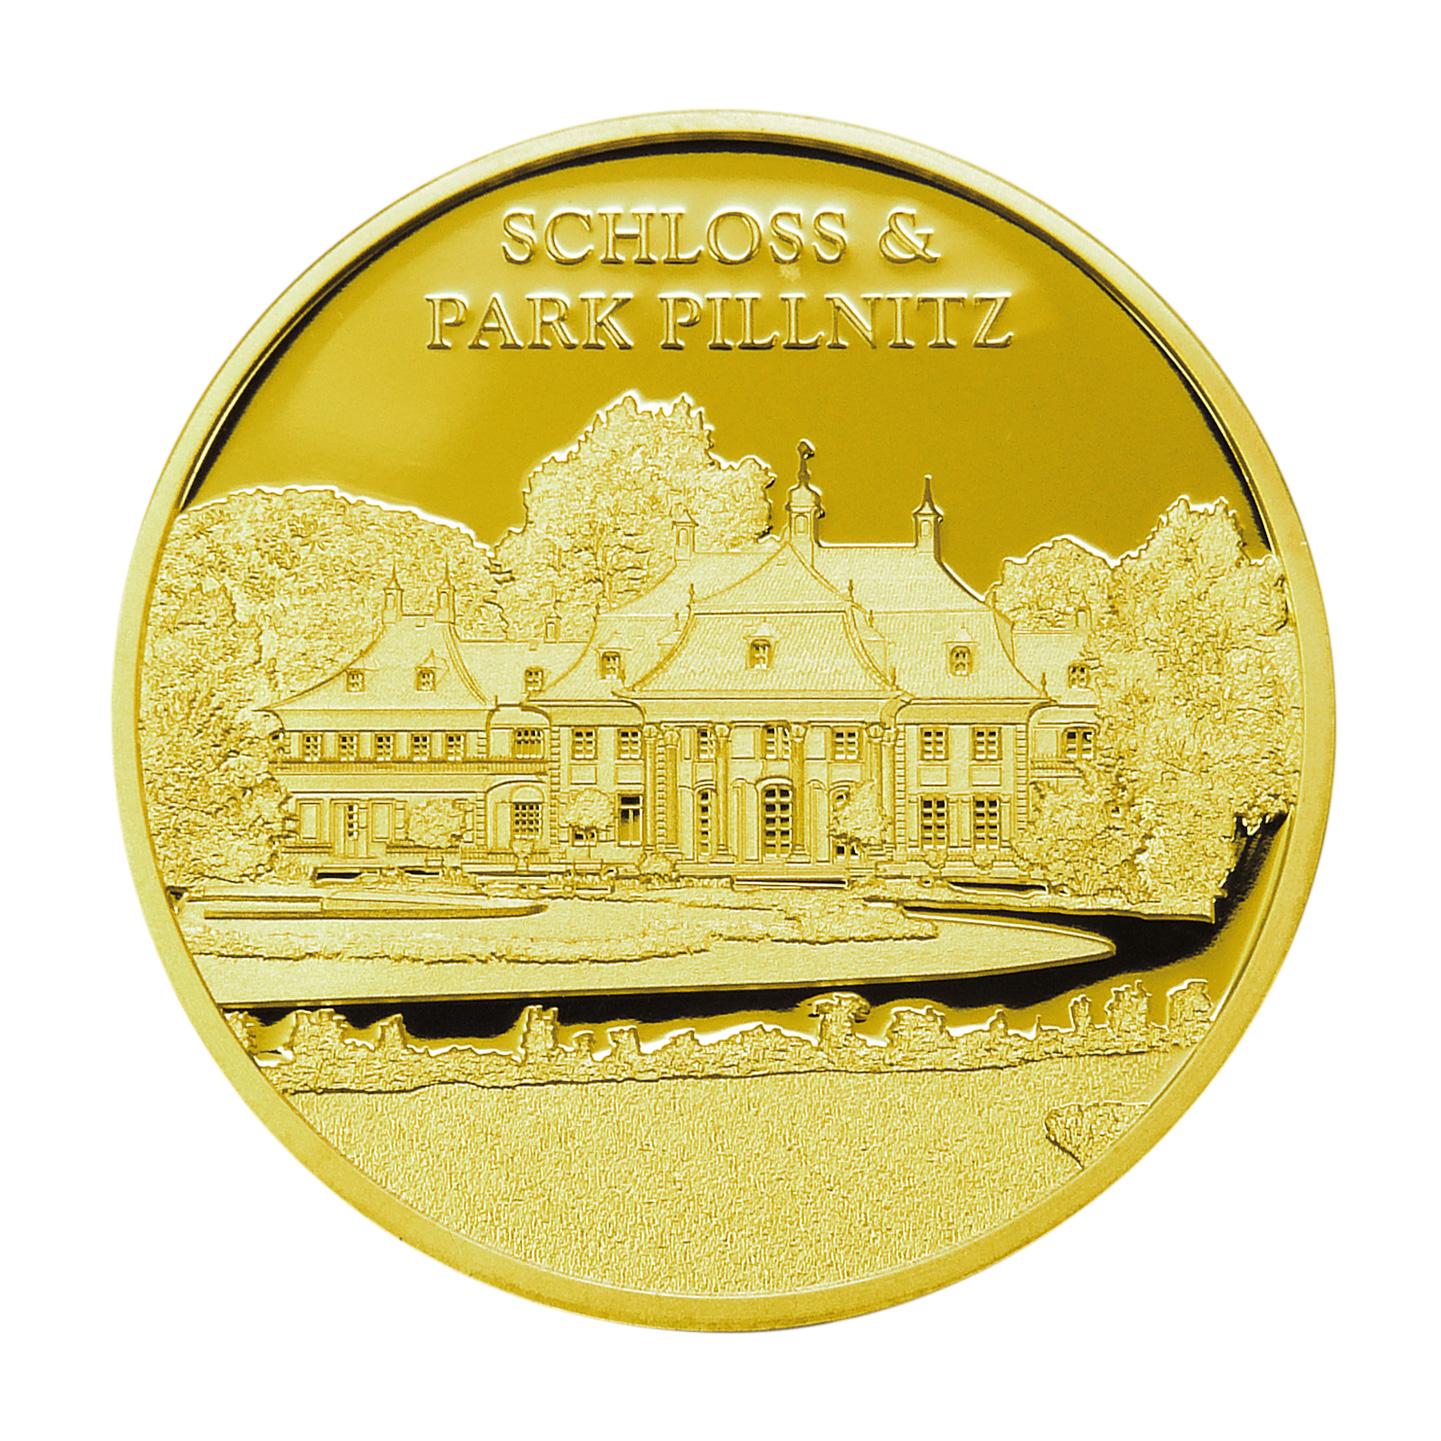 350-GB-August-der-Starke_Schloss_Pillnitz_VS_FG